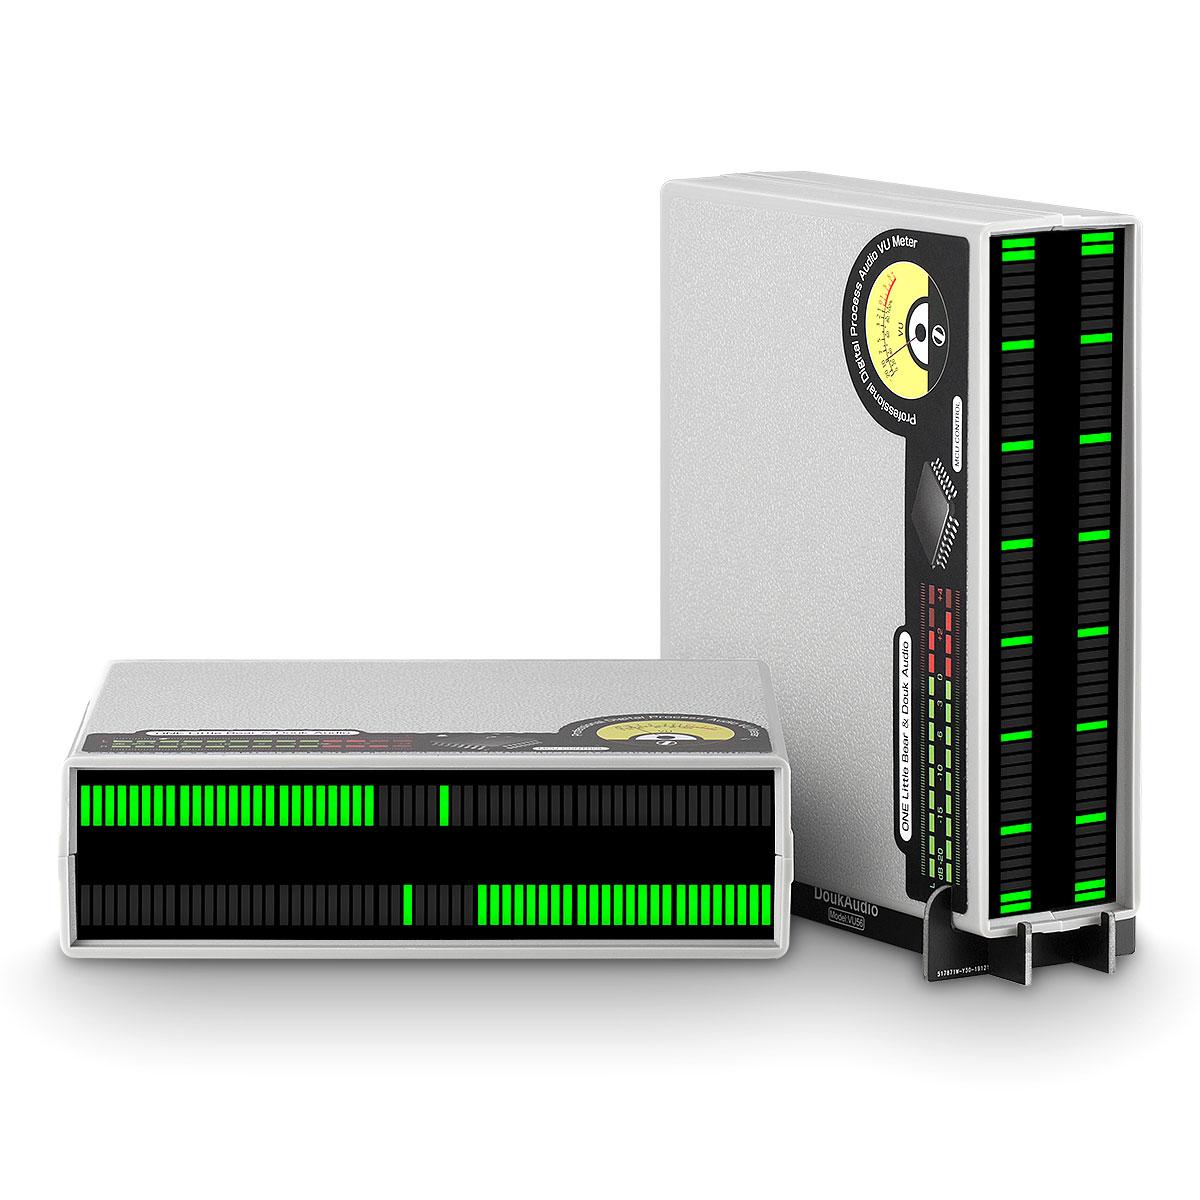 VU meter wskaźnik wysterowania LED audio stereoo